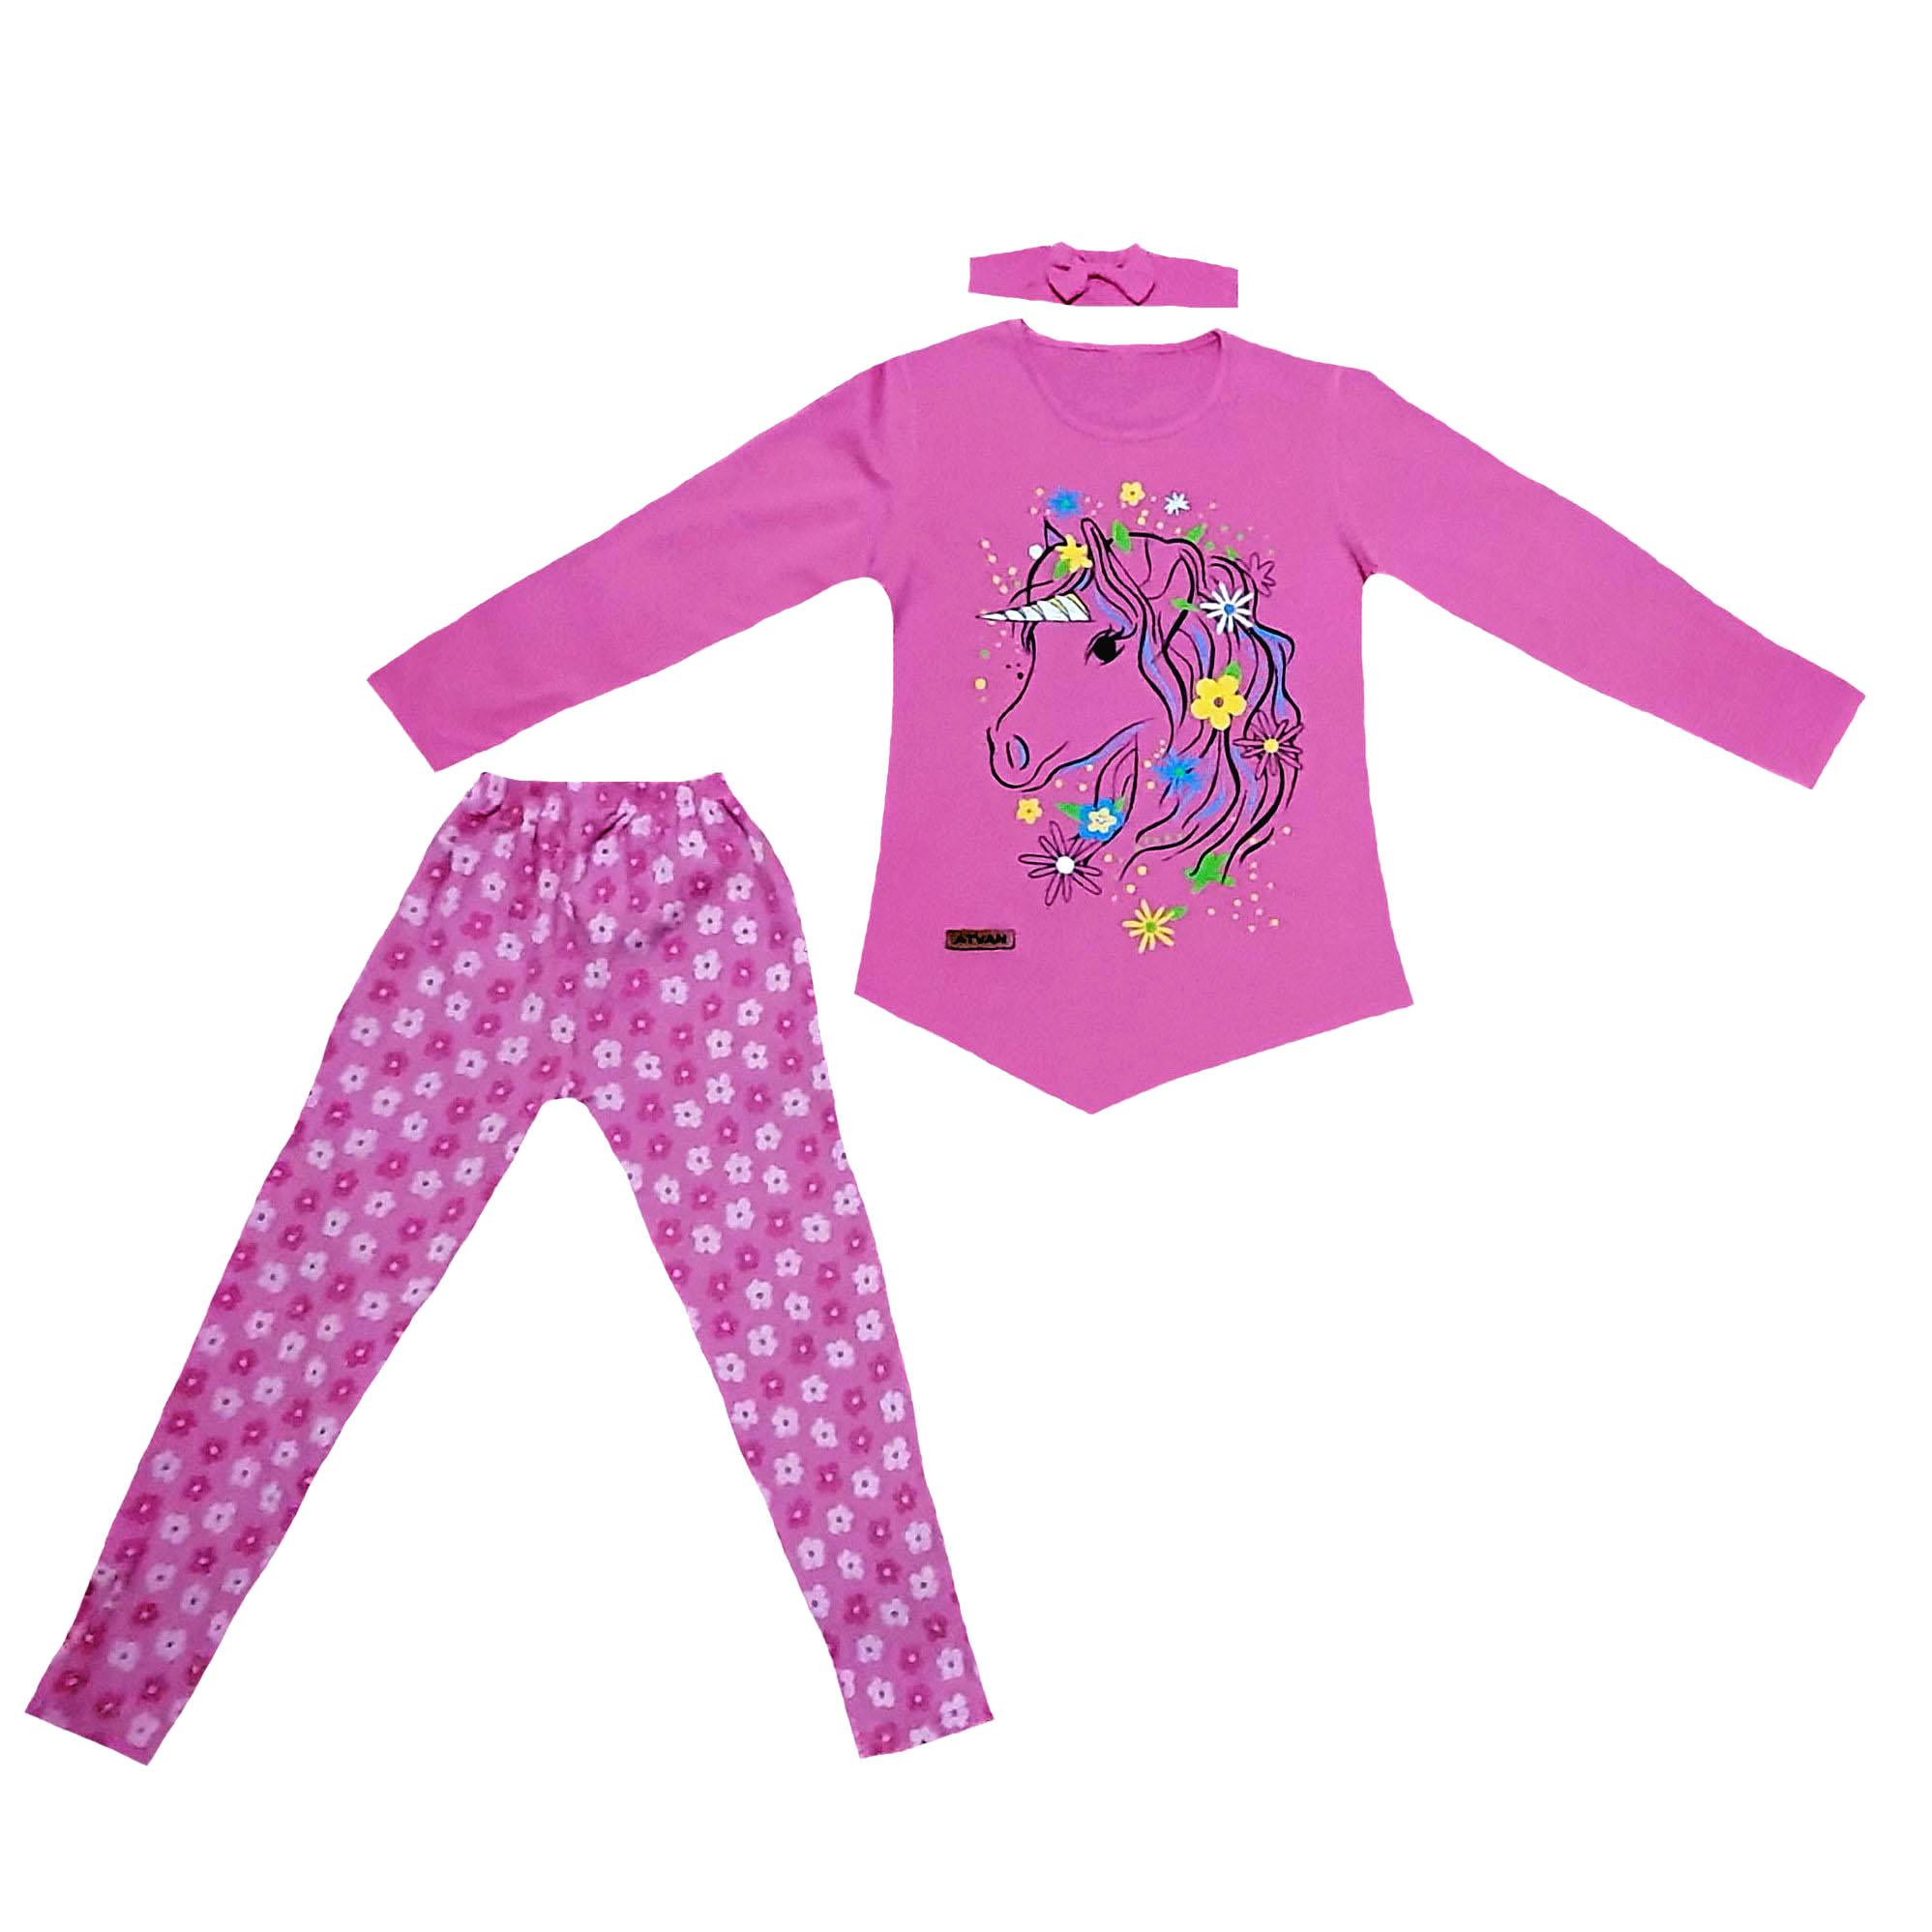 ست 3 تکه لباس دخترانه طرح اسب تک شاخ کد 98120104